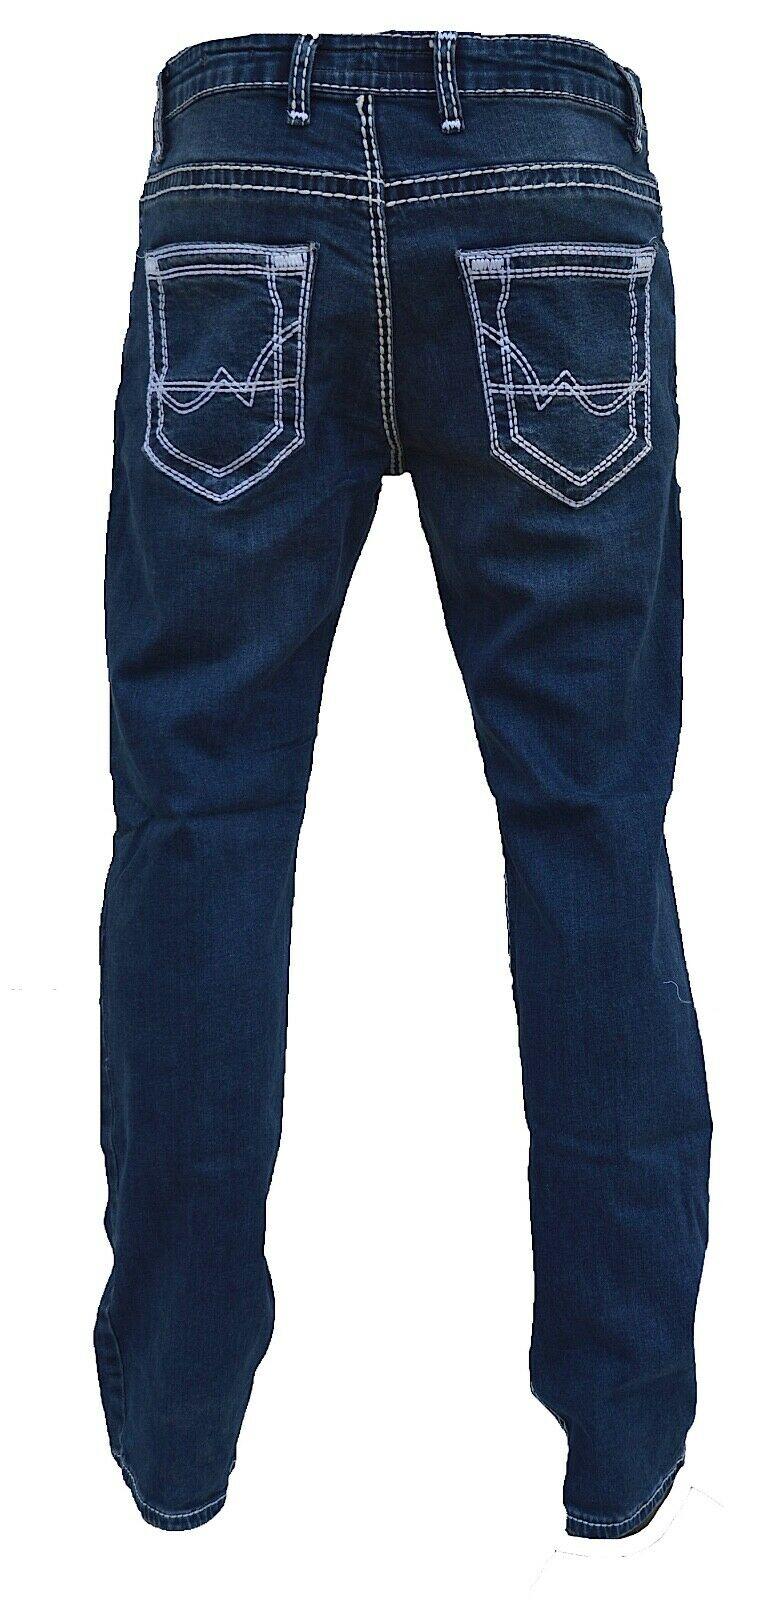 Herren-Jeans-Hose-Denim-KC-Black-Washed-Straight-Cut-Regular-Dicke-Naht-naehte Indexbild 23